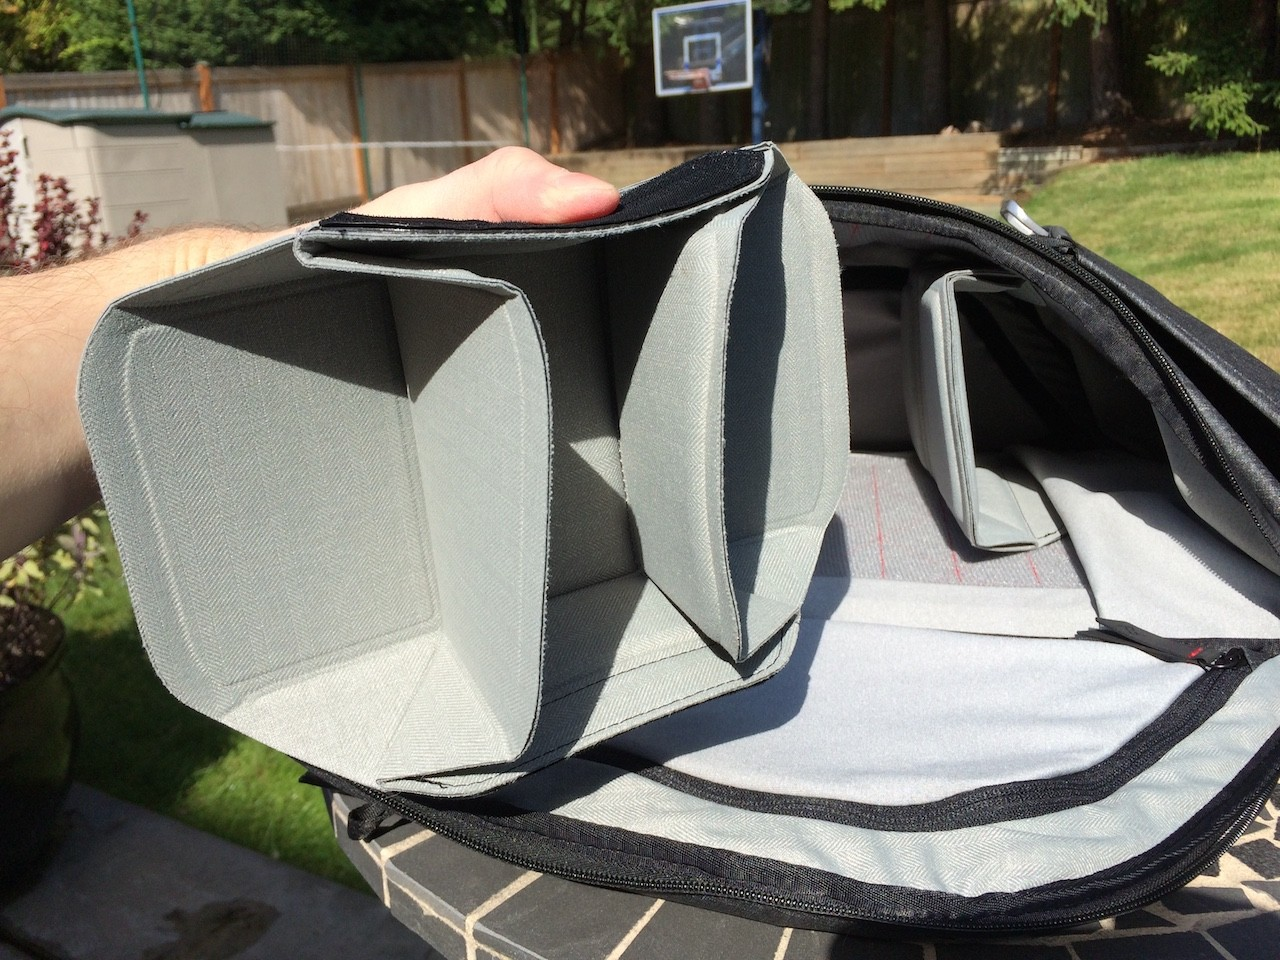 Peak Design Everyday Backpack folding divider closeup